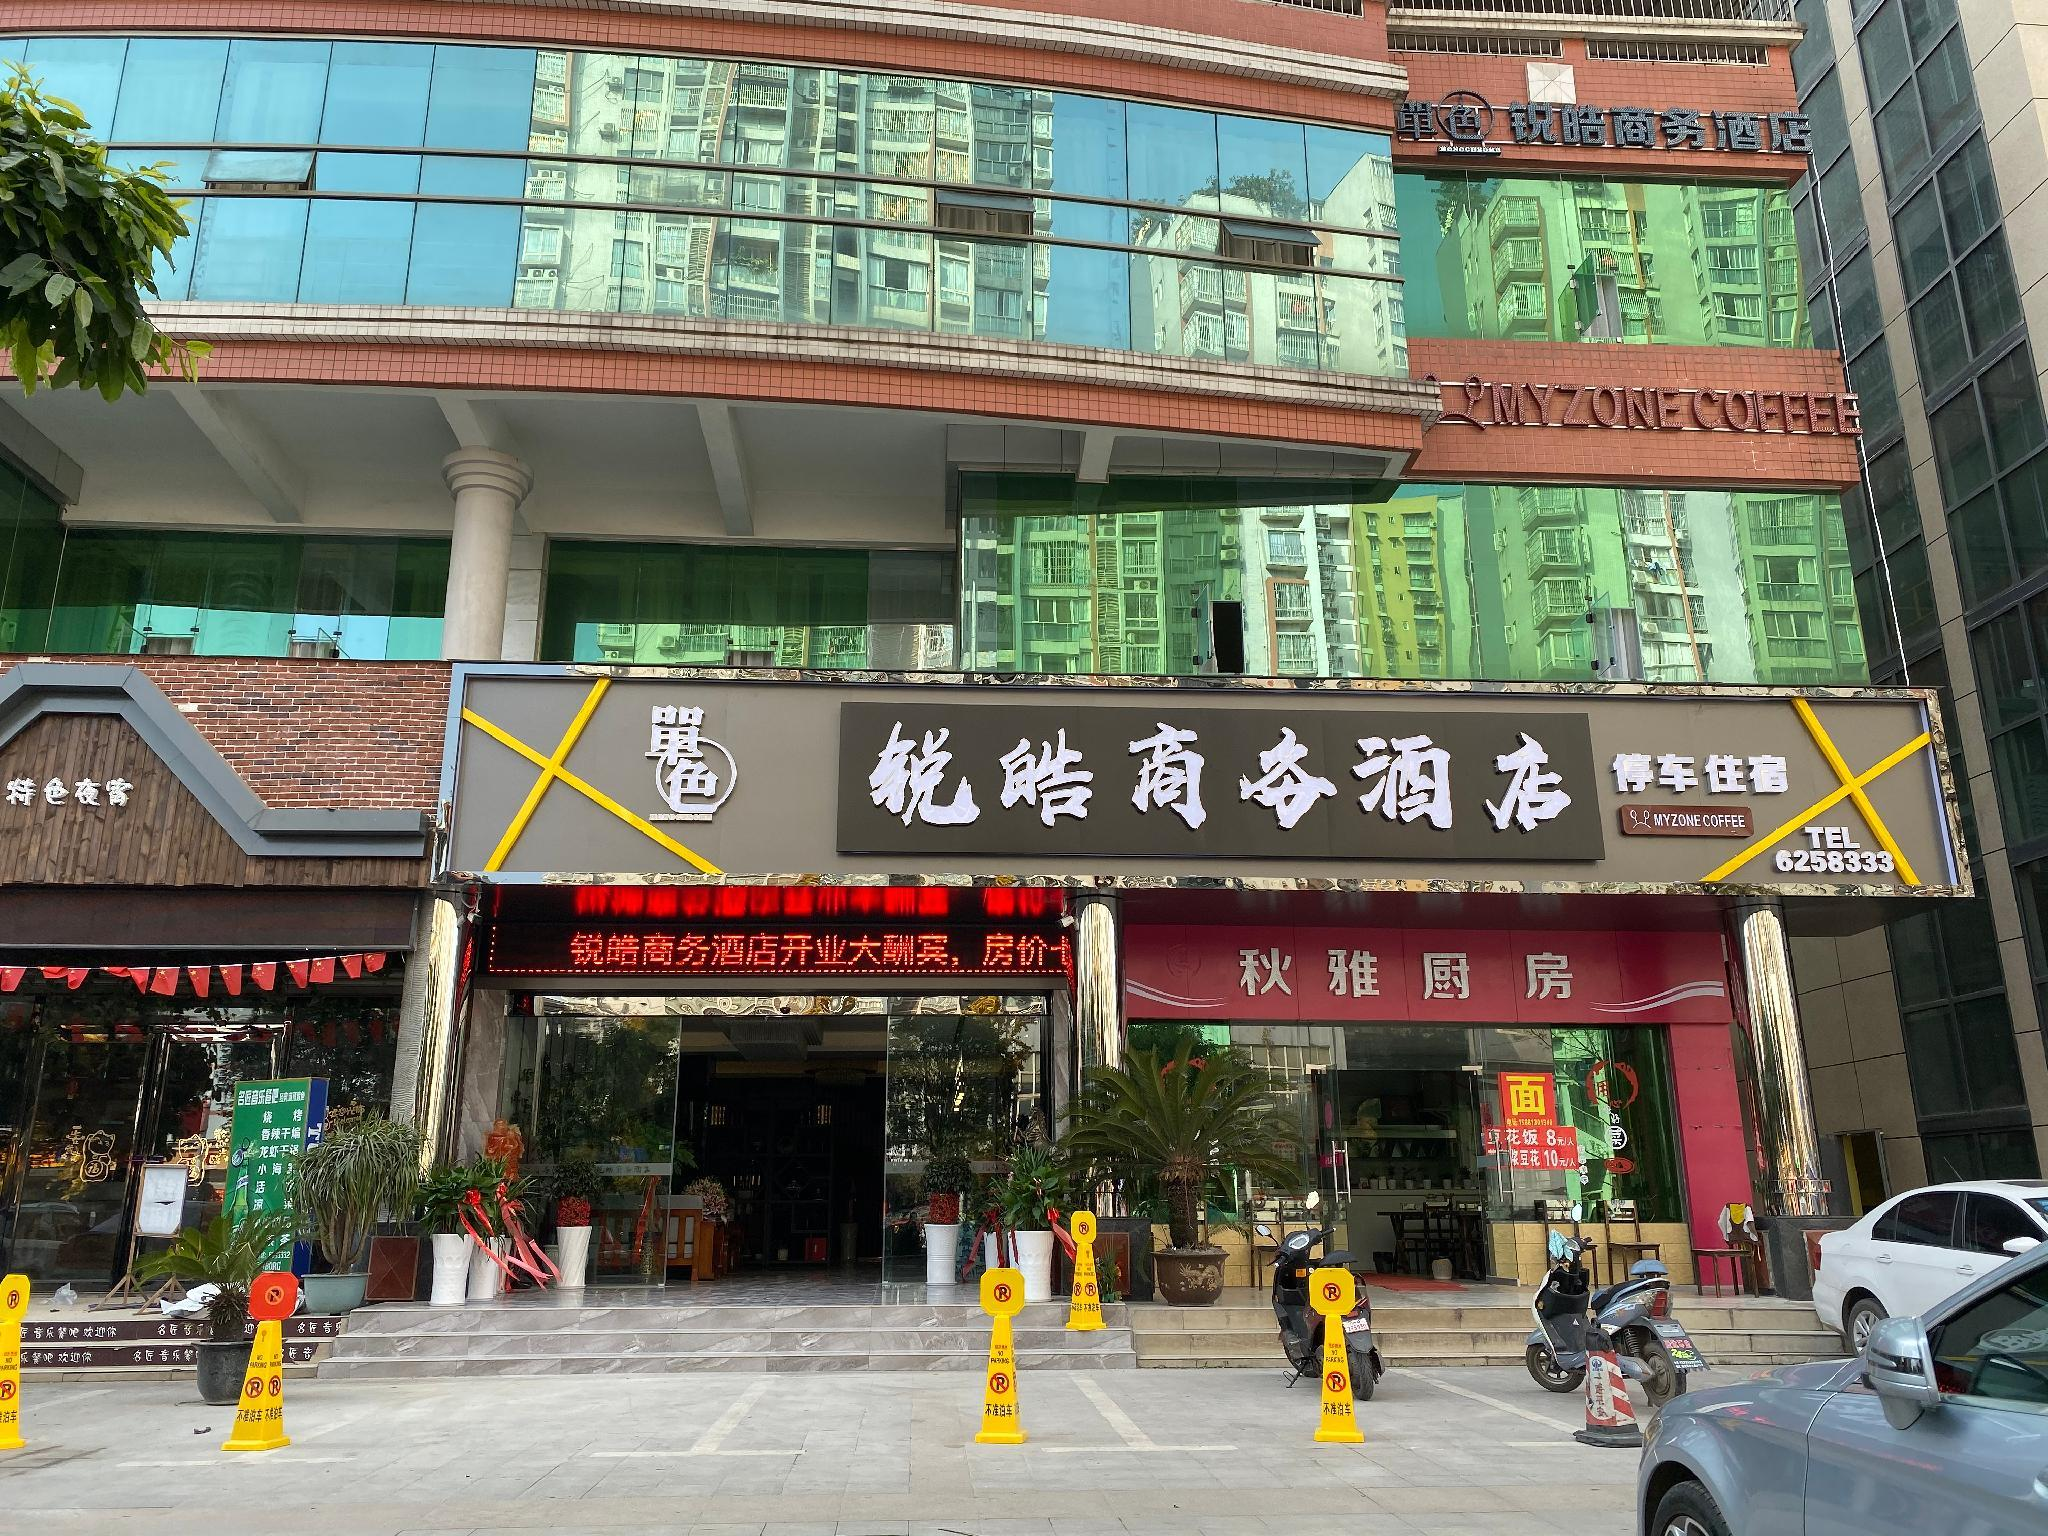 Monochrome Hotel Yibin Ruihao Business